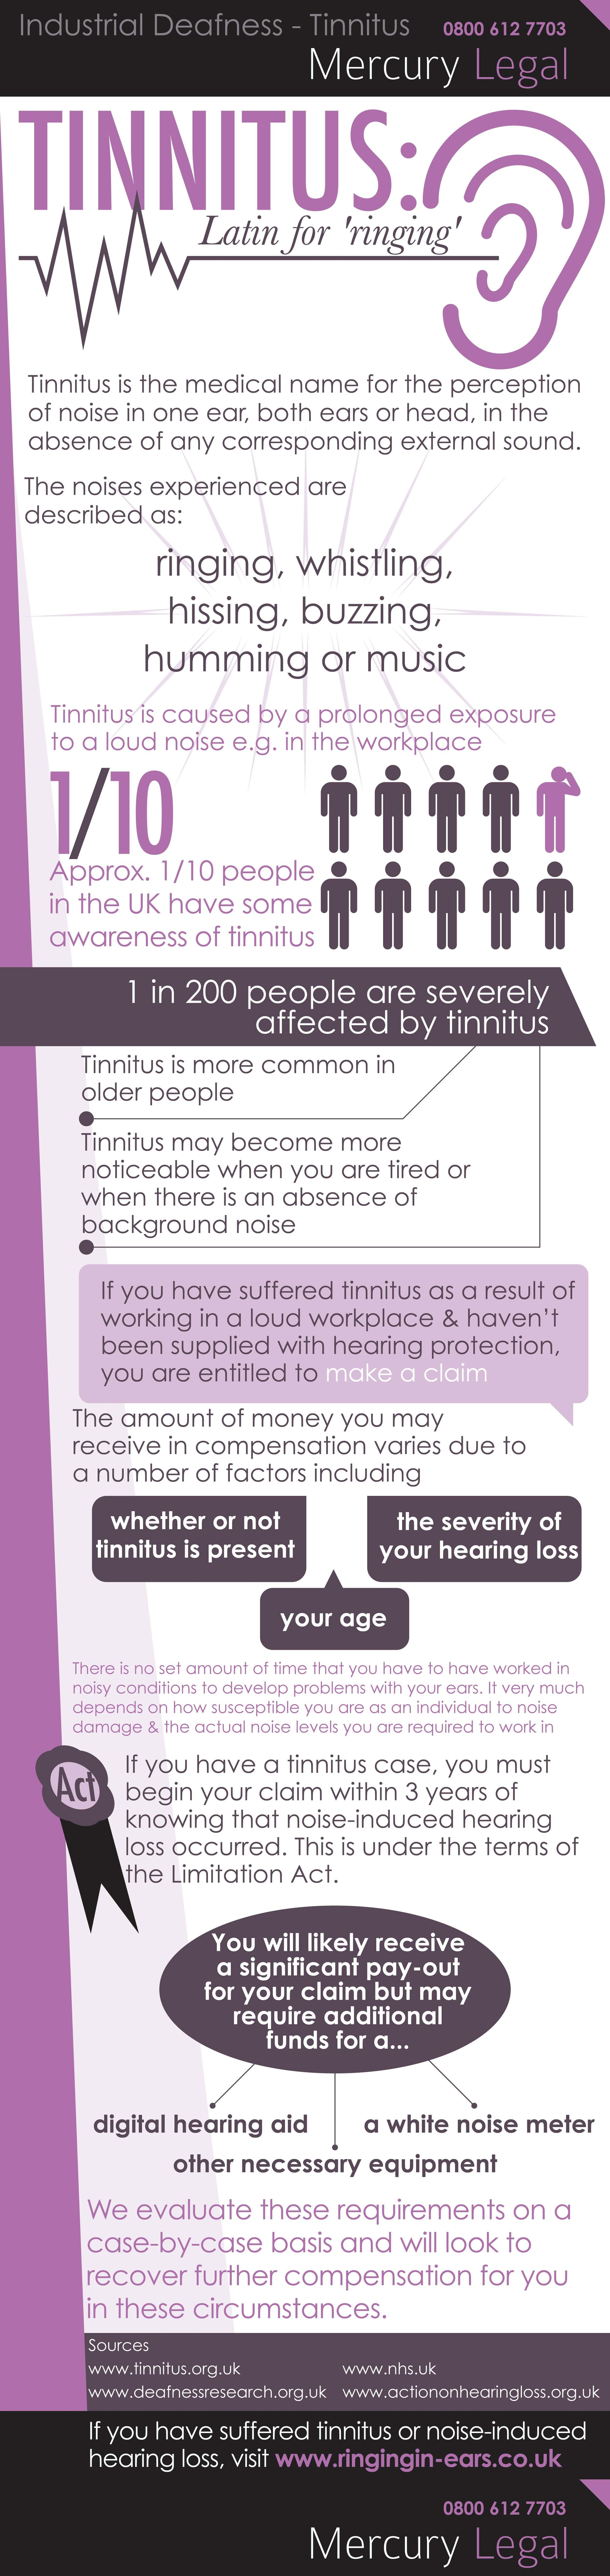 Tinnitus Infographic